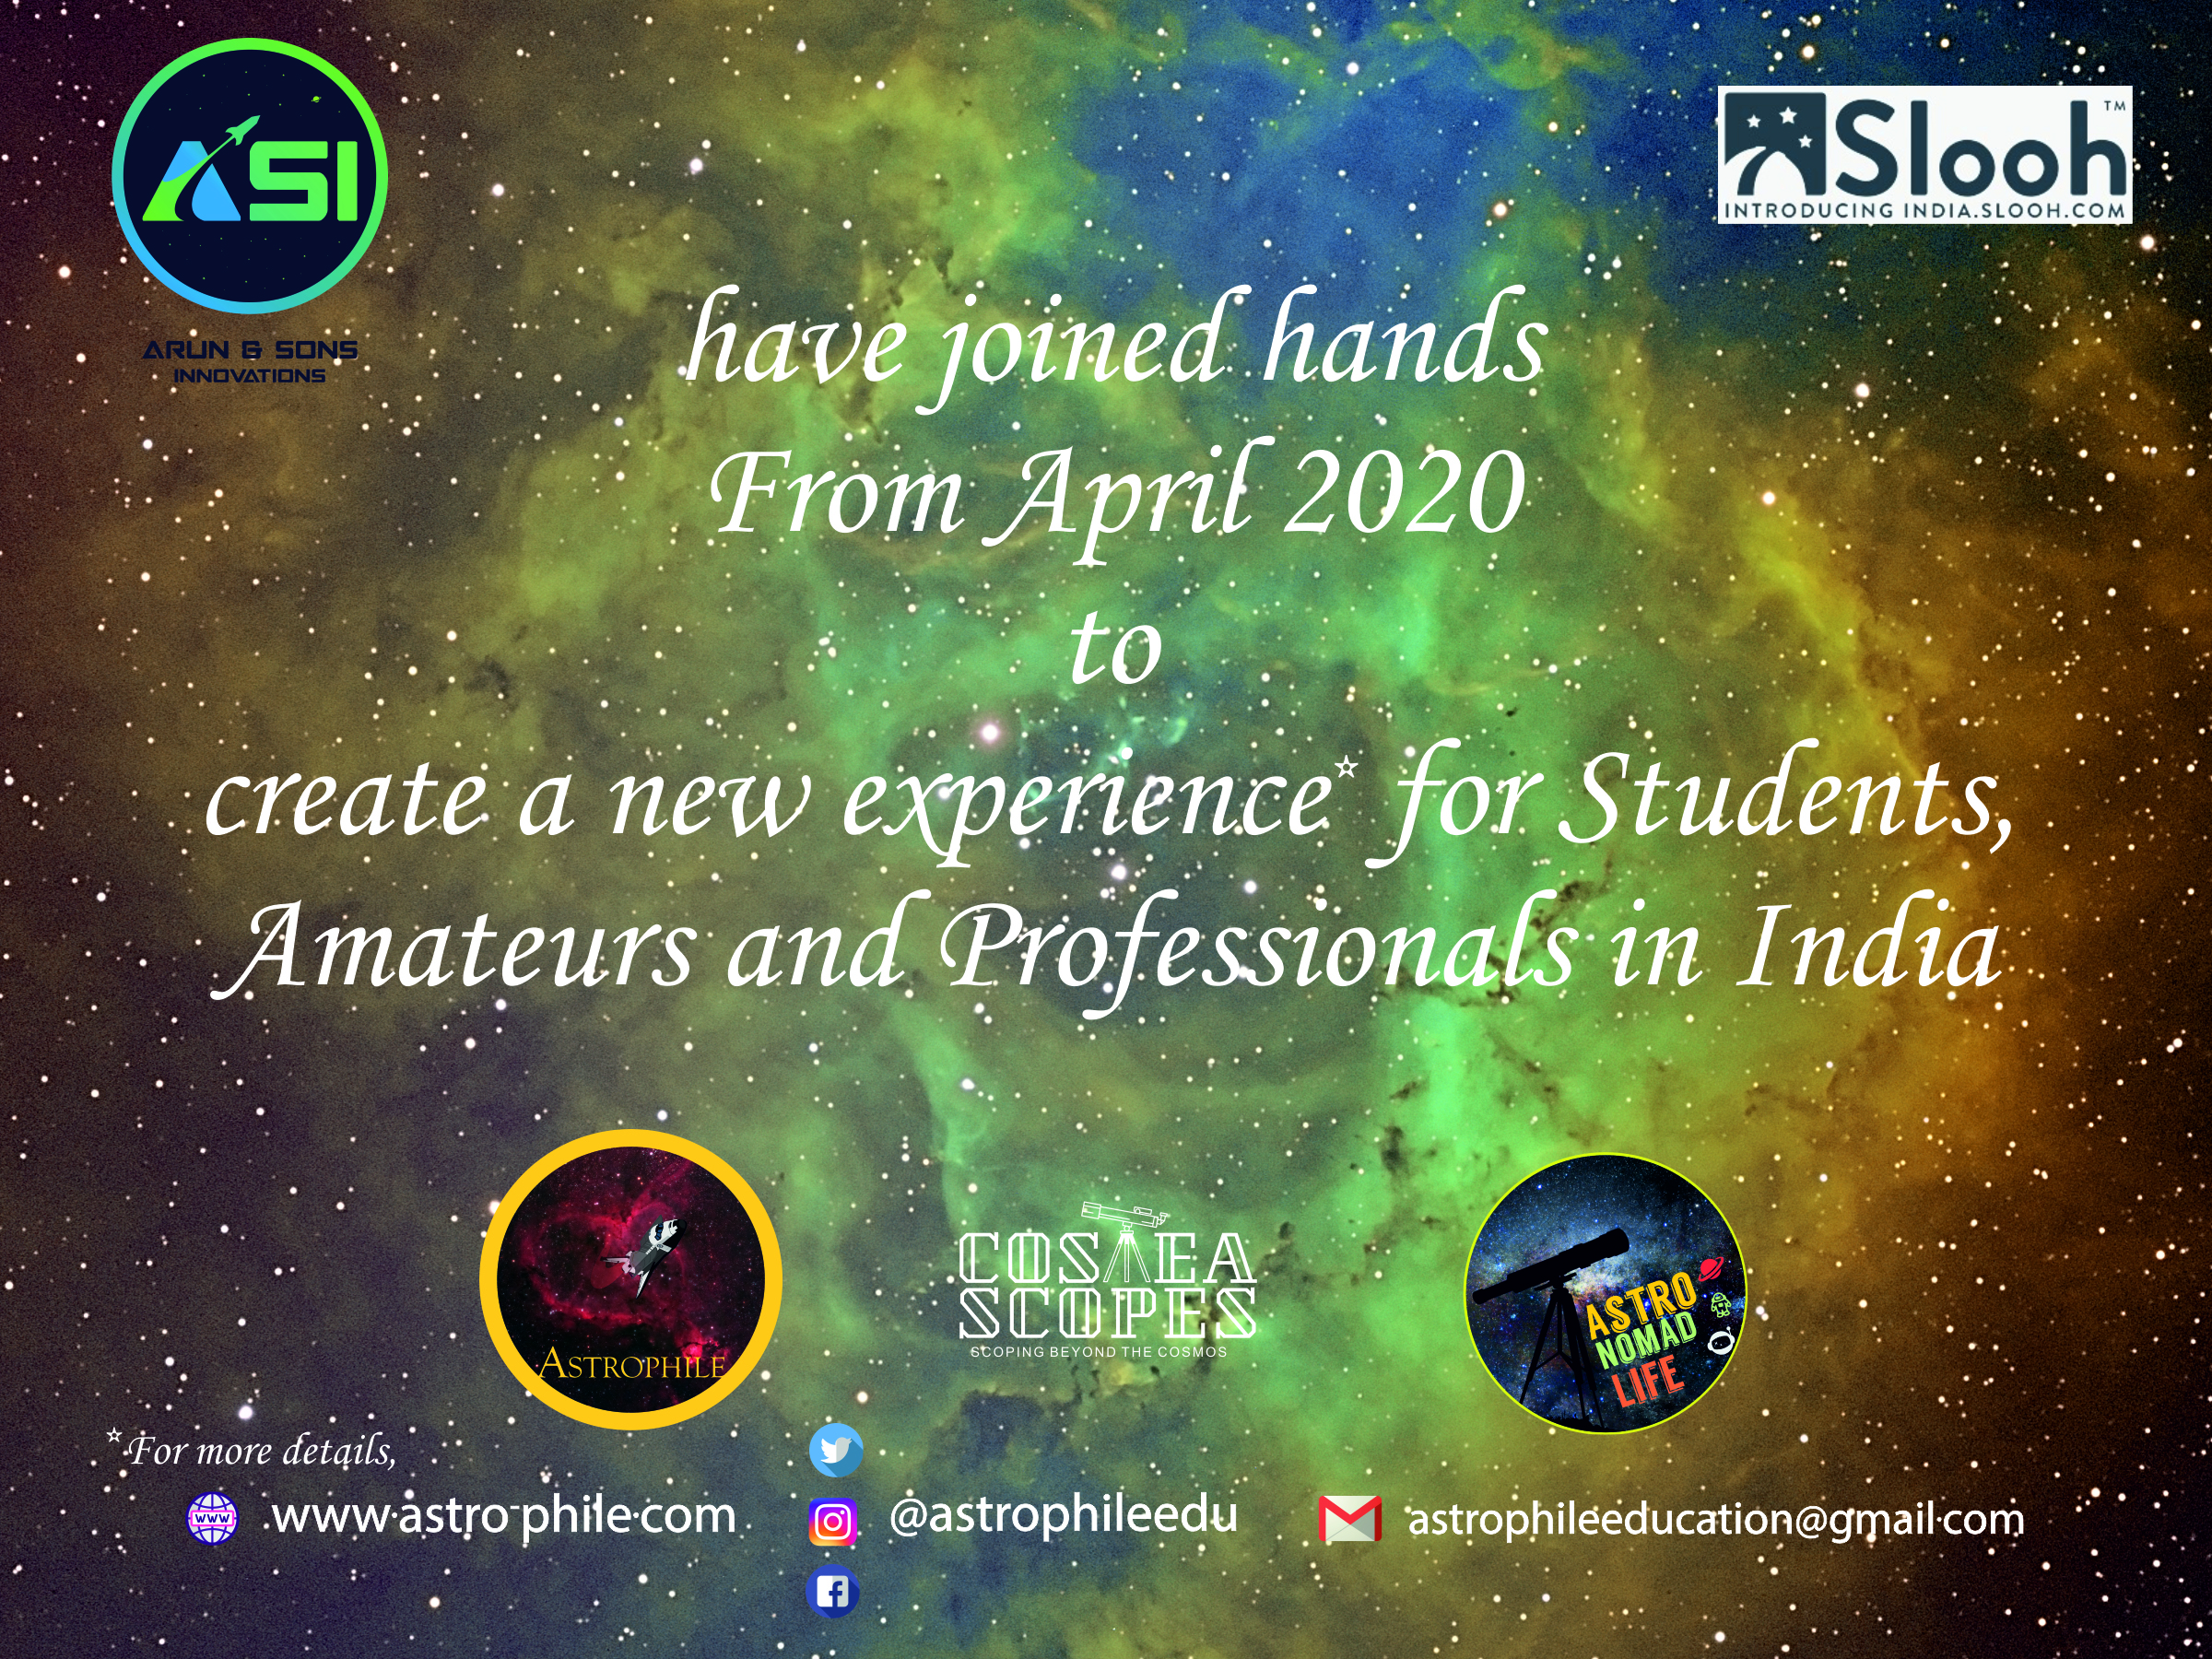 Slooh ASI collaboration Announcement